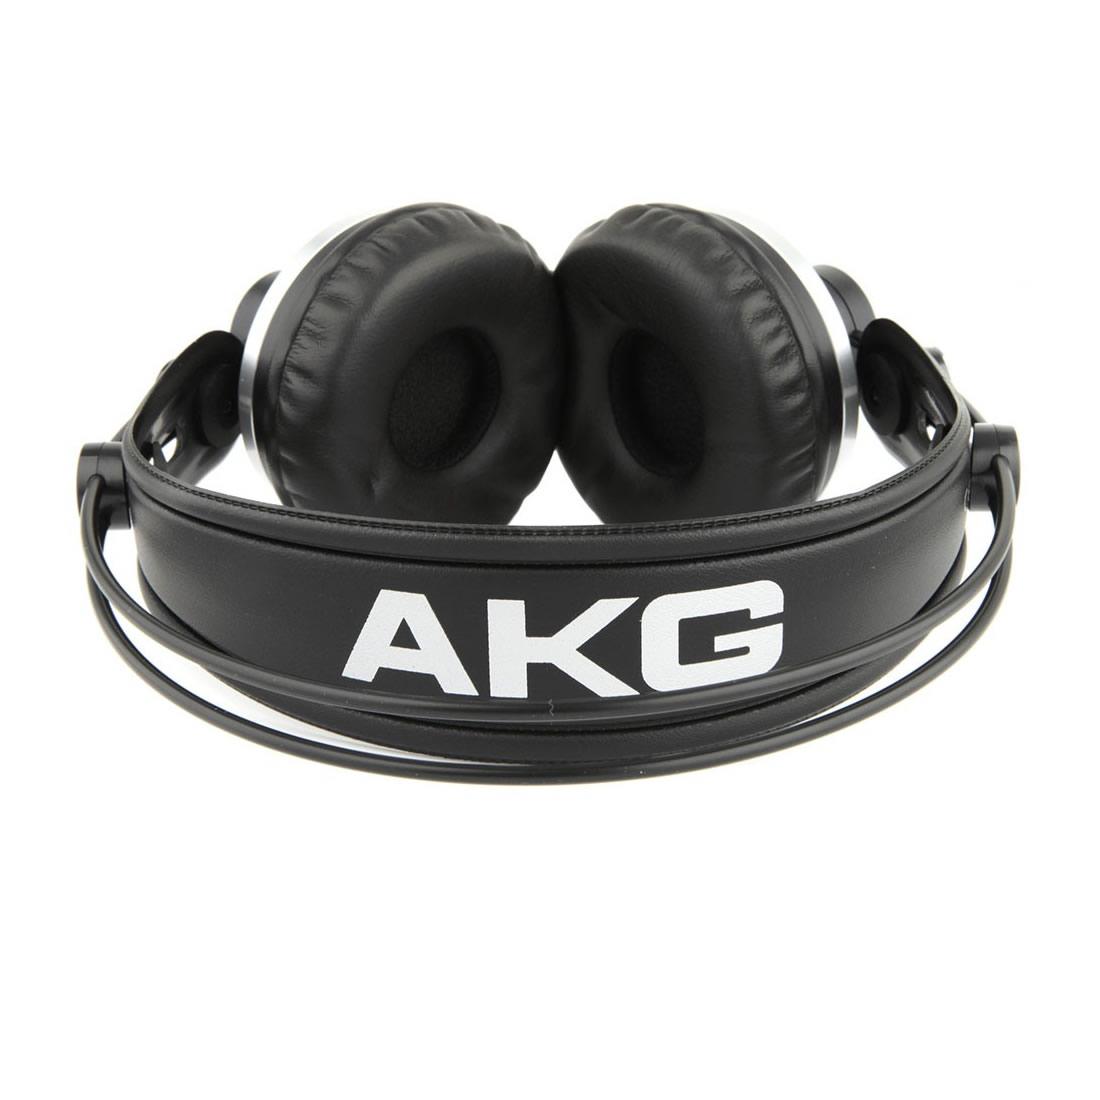 Akg K-171 MK II Fone de Ouvido